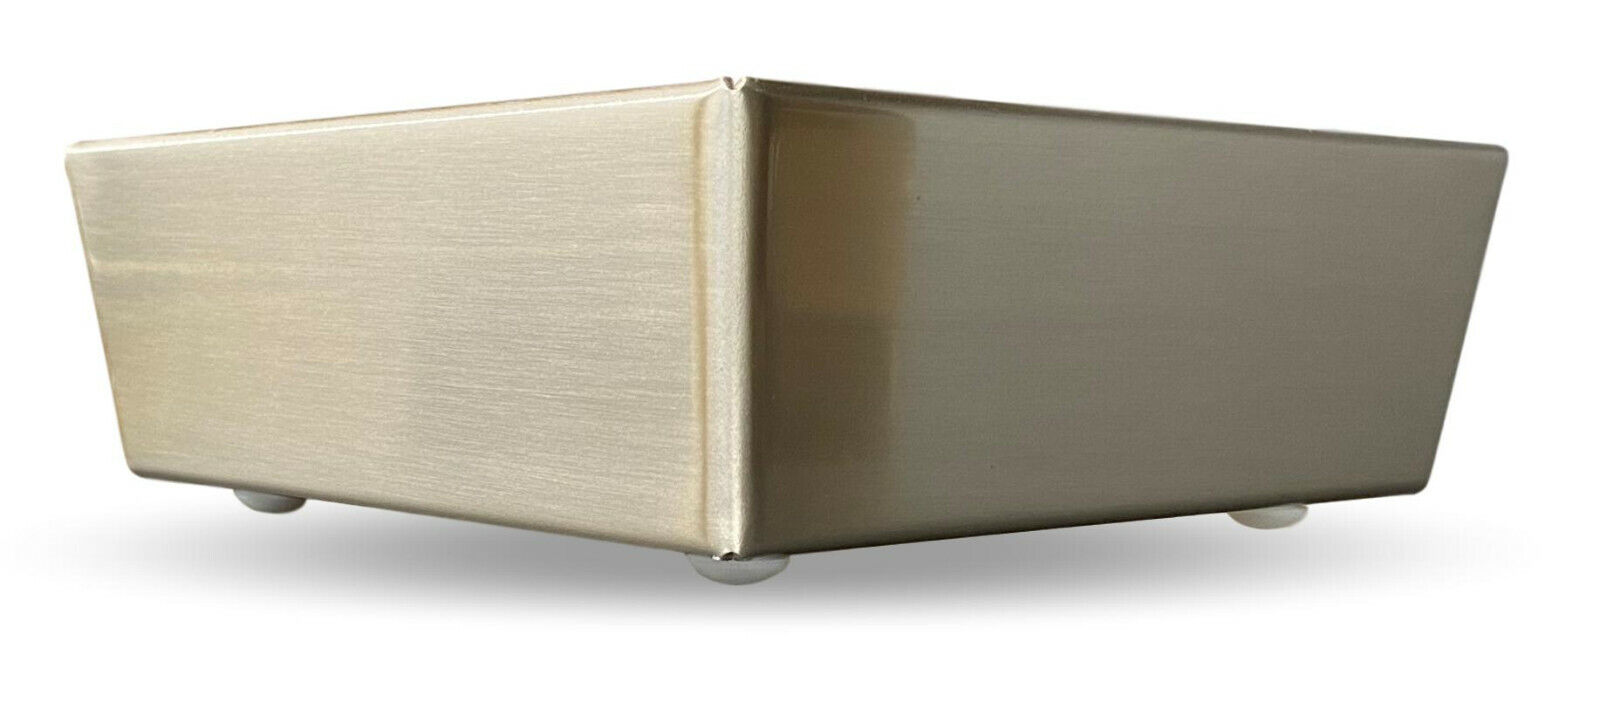 2-1/2″ Polished Brushed Nickel Metal Triangle Corner Furniture Legs – Set of 4 Furniture